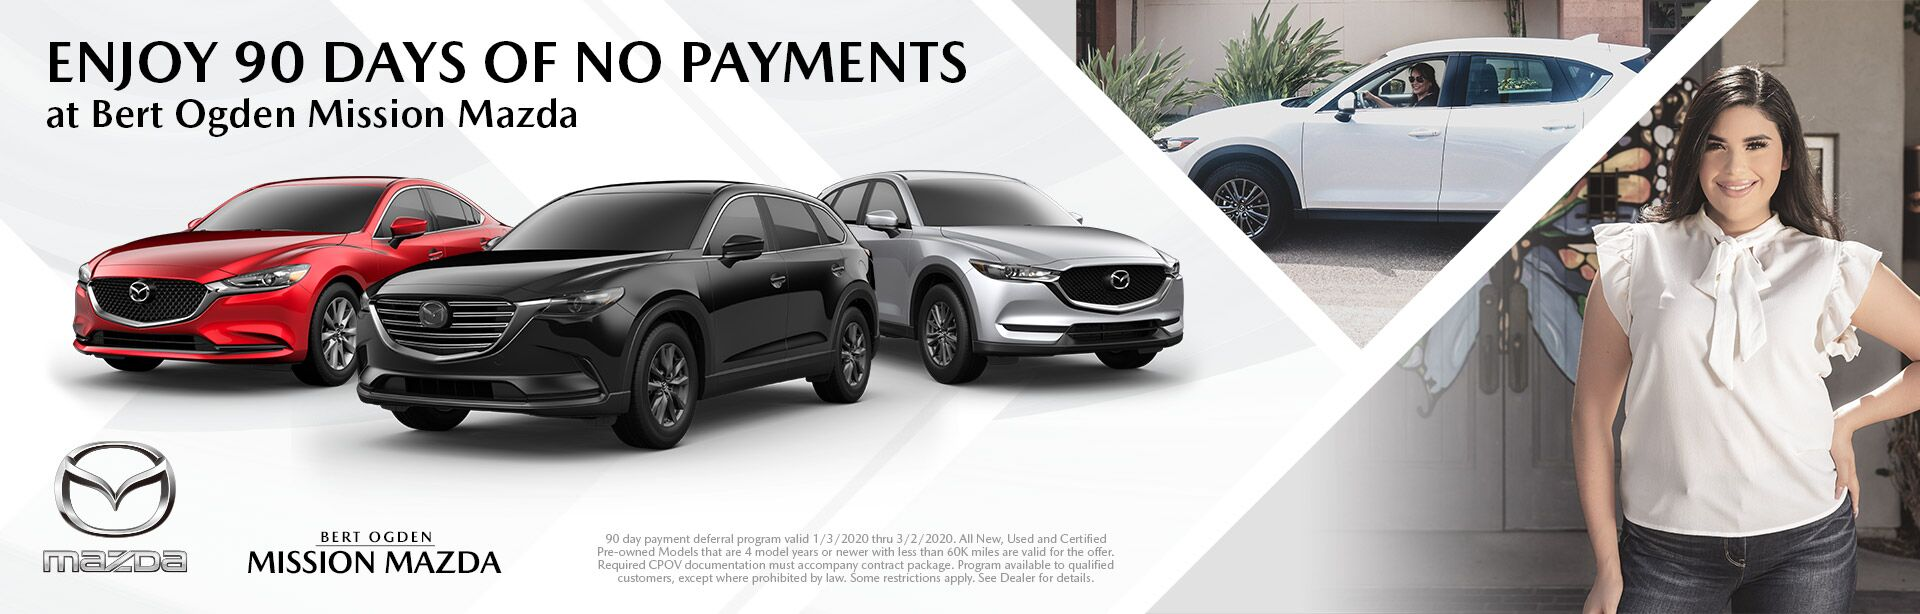 No Payments For 90 Days - Bert Ogden Mission Mazda - Mission, TX